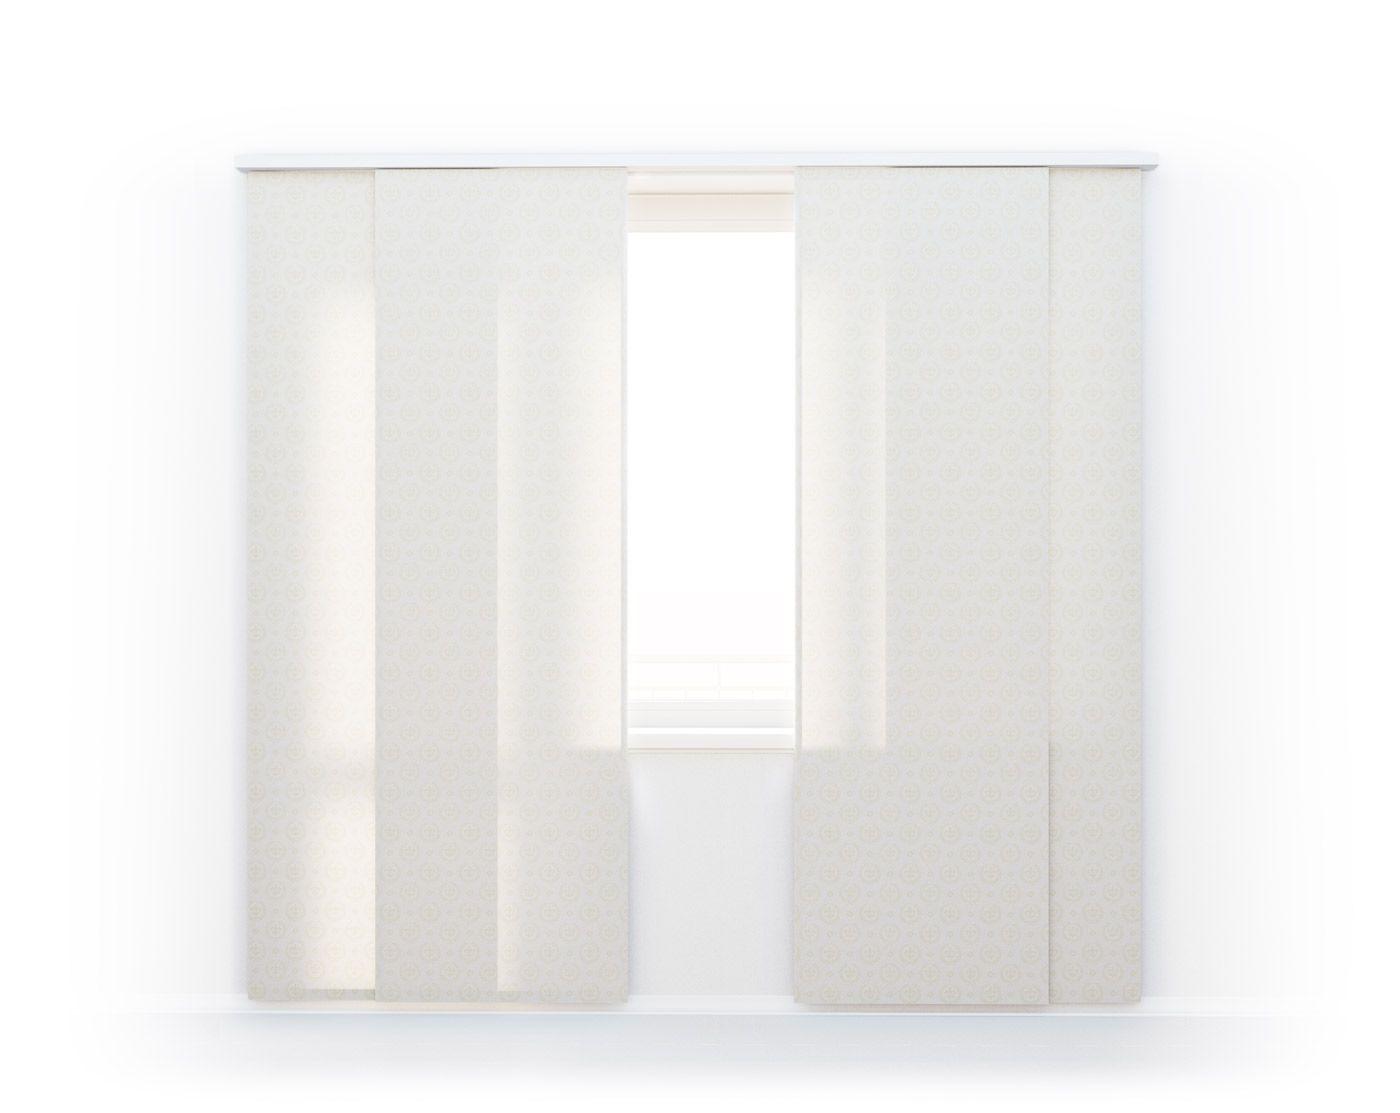 Японские шторы Louis D'or, 2382/11